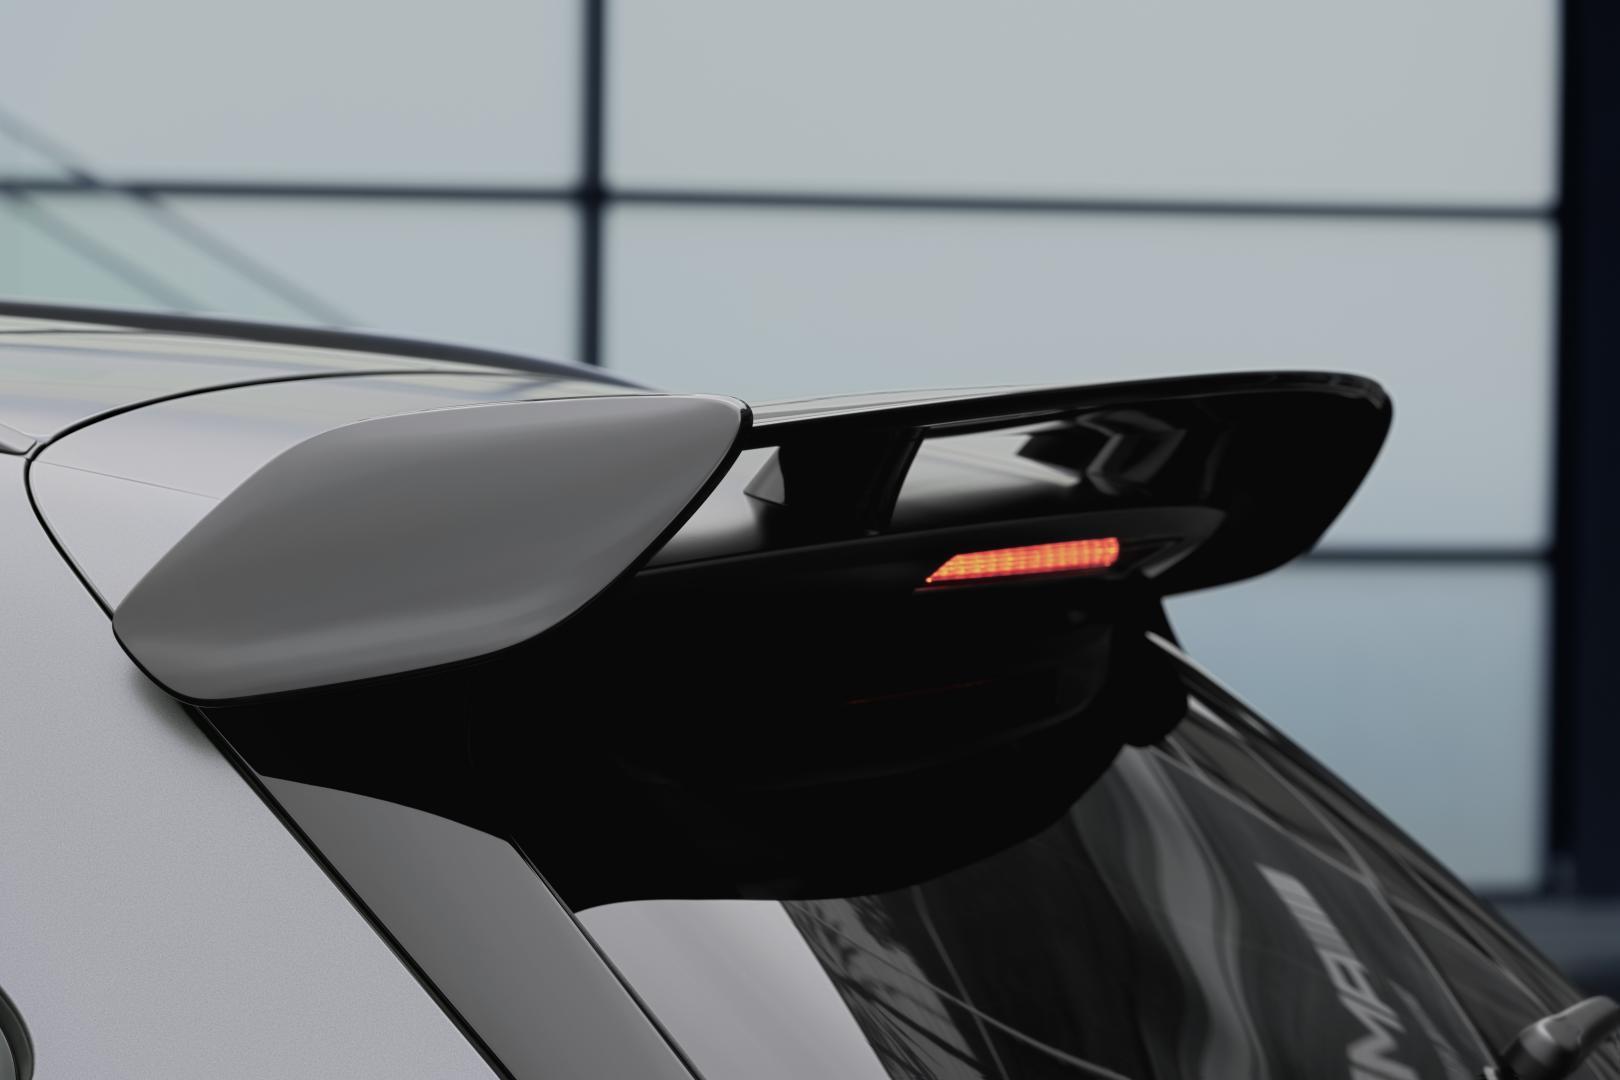 Mercedes-AMG GLA 45 S achterspoiler